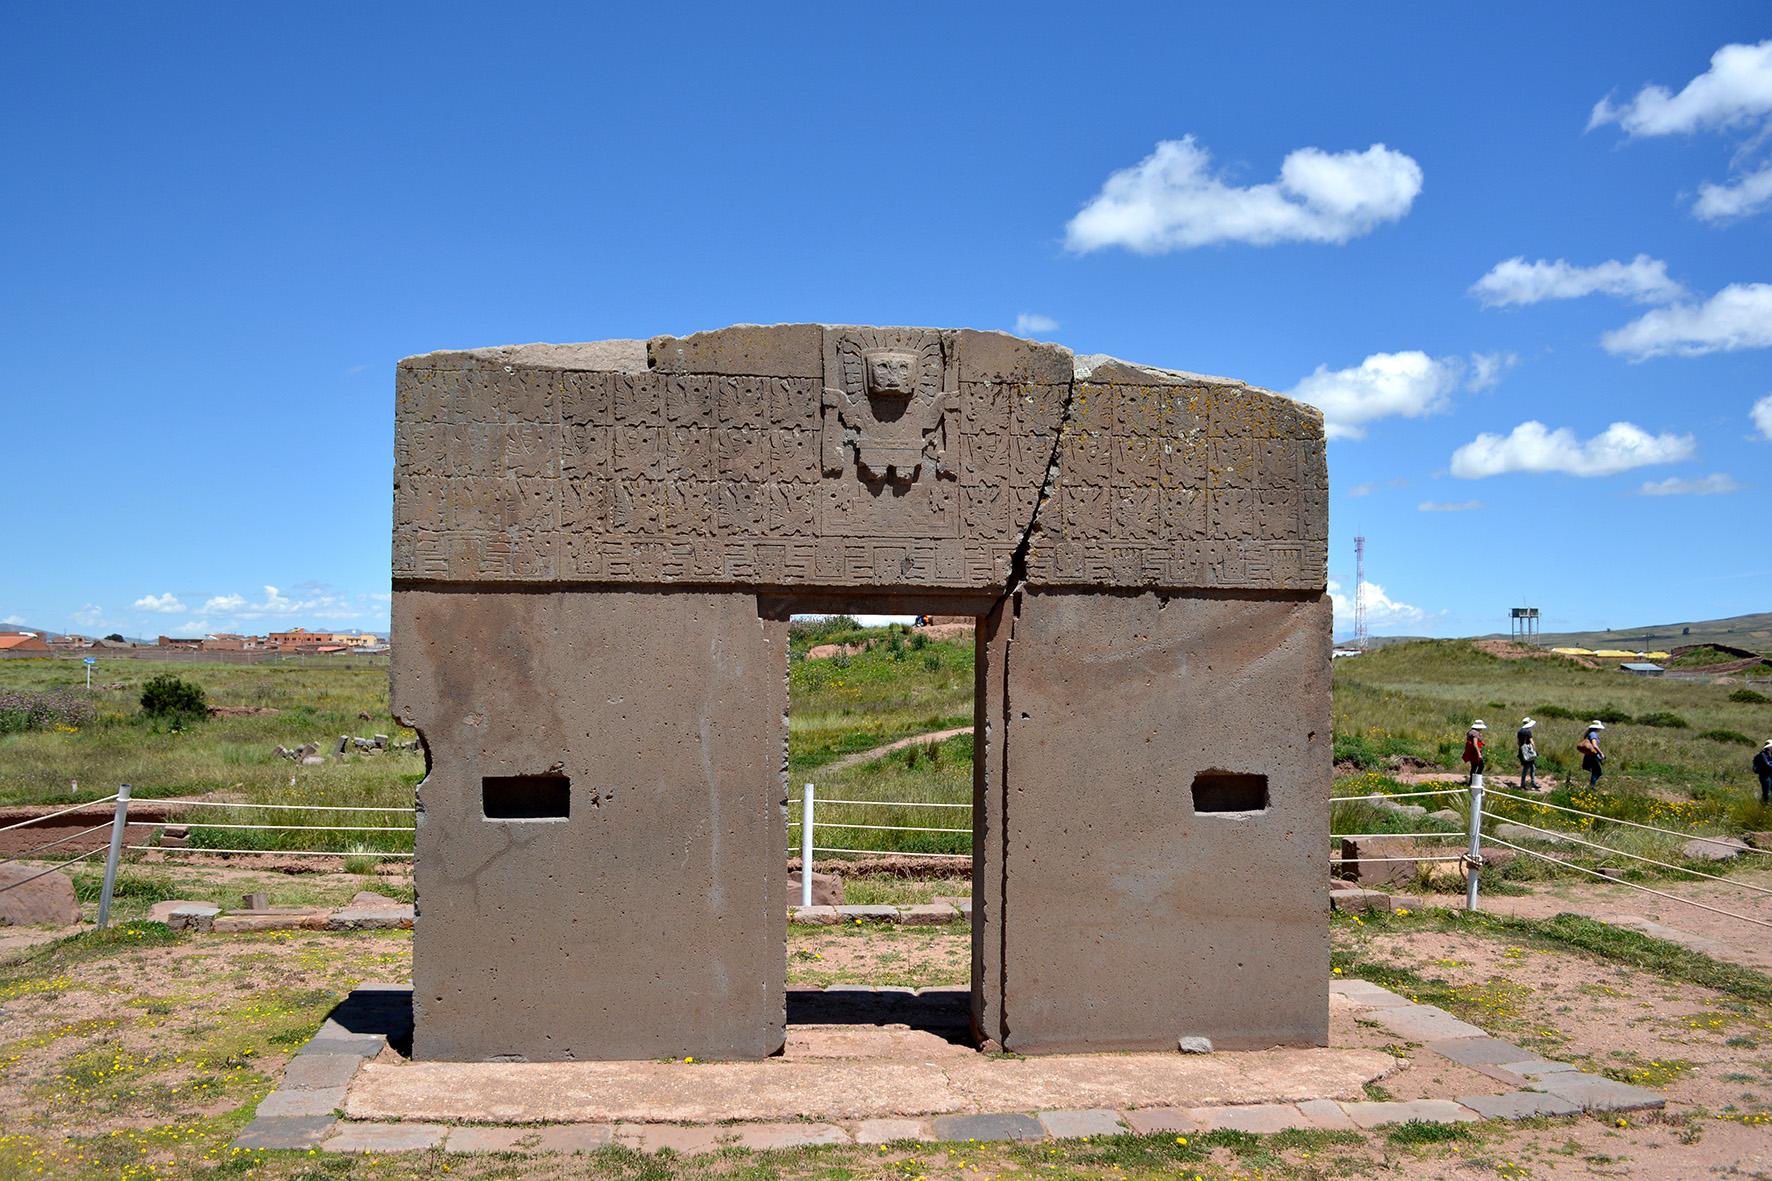 Templo do Sol - Tiwanaku